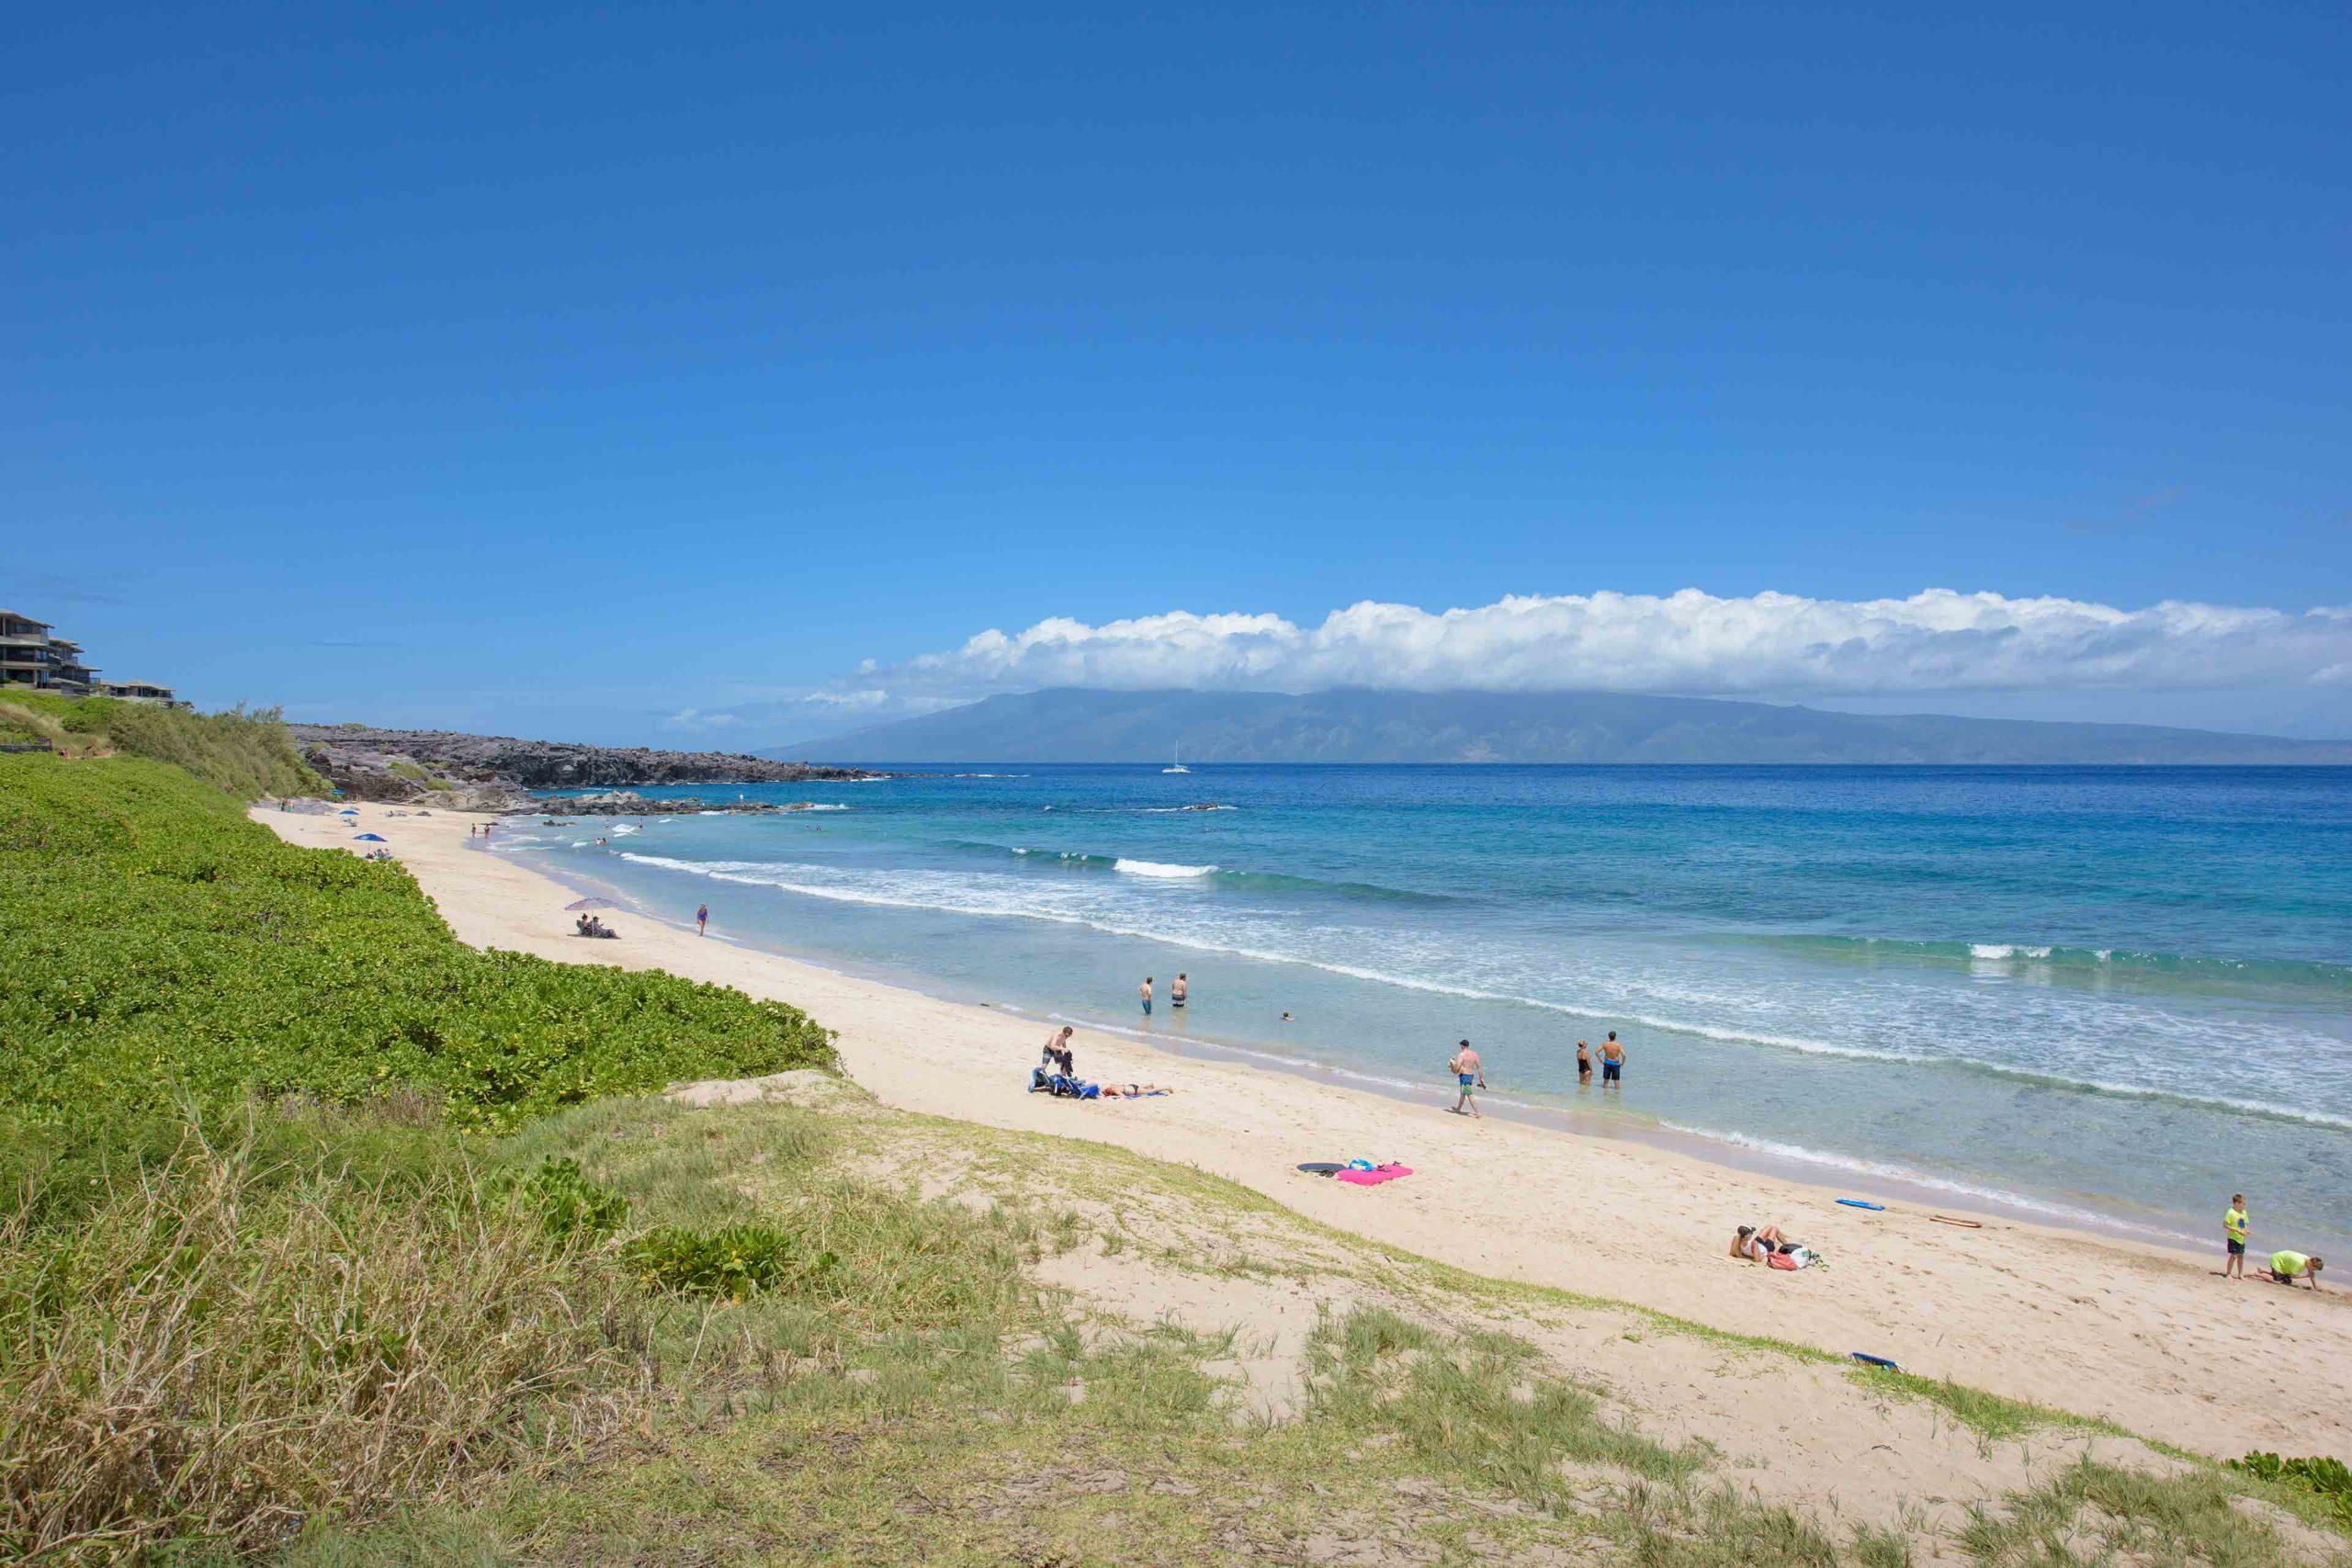 South views of Oneloa Beach or Ironwoods Beach